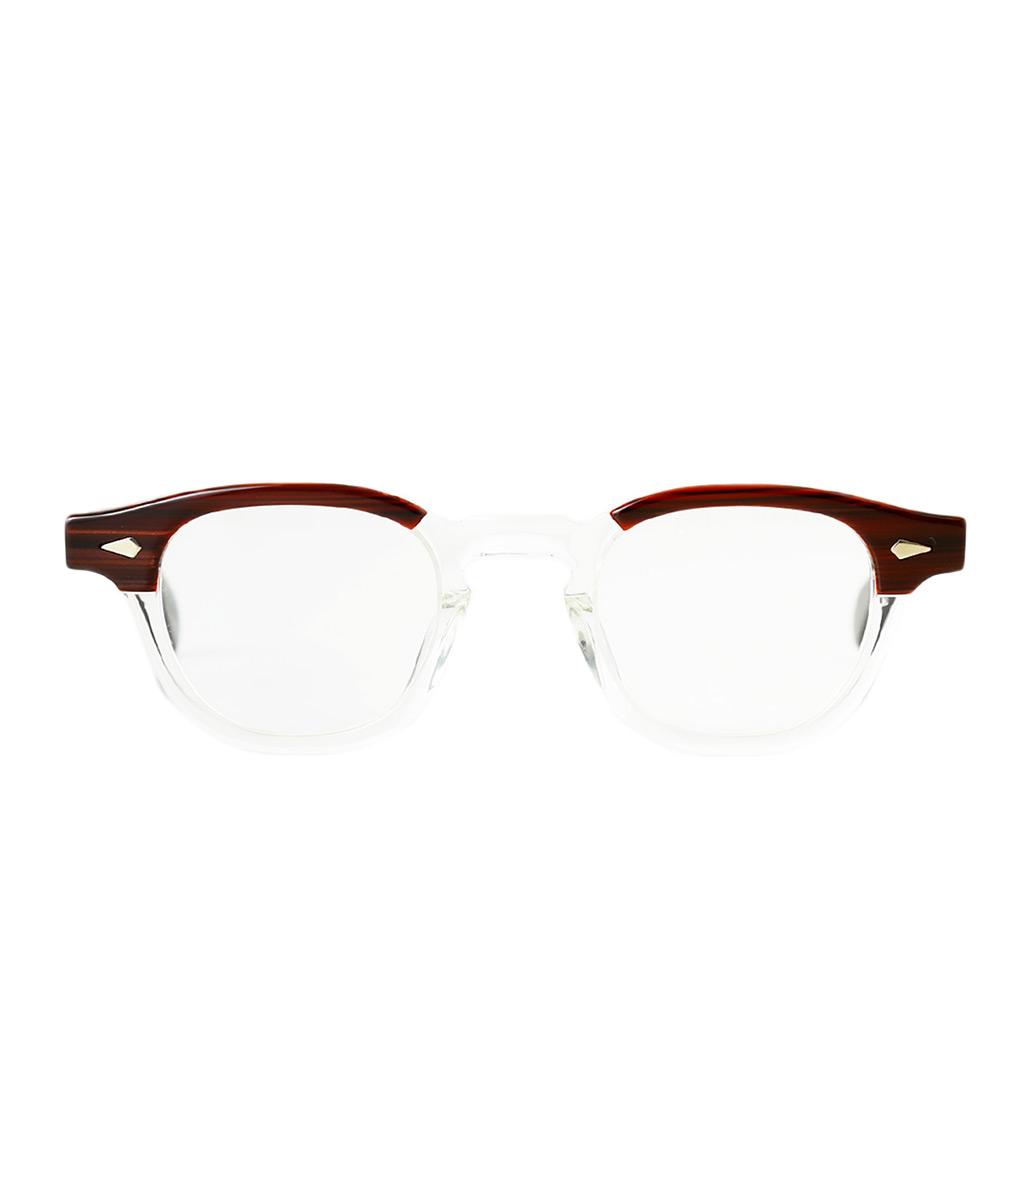 JULIUS TART OPTICAL / ジュリアスタートオプティカル : AR 44-24 - RED WOOD / CLEAR - : サングラス アクセサリー メガネ 眼鏡 : JTPL-101J-2J-wise【WIS】